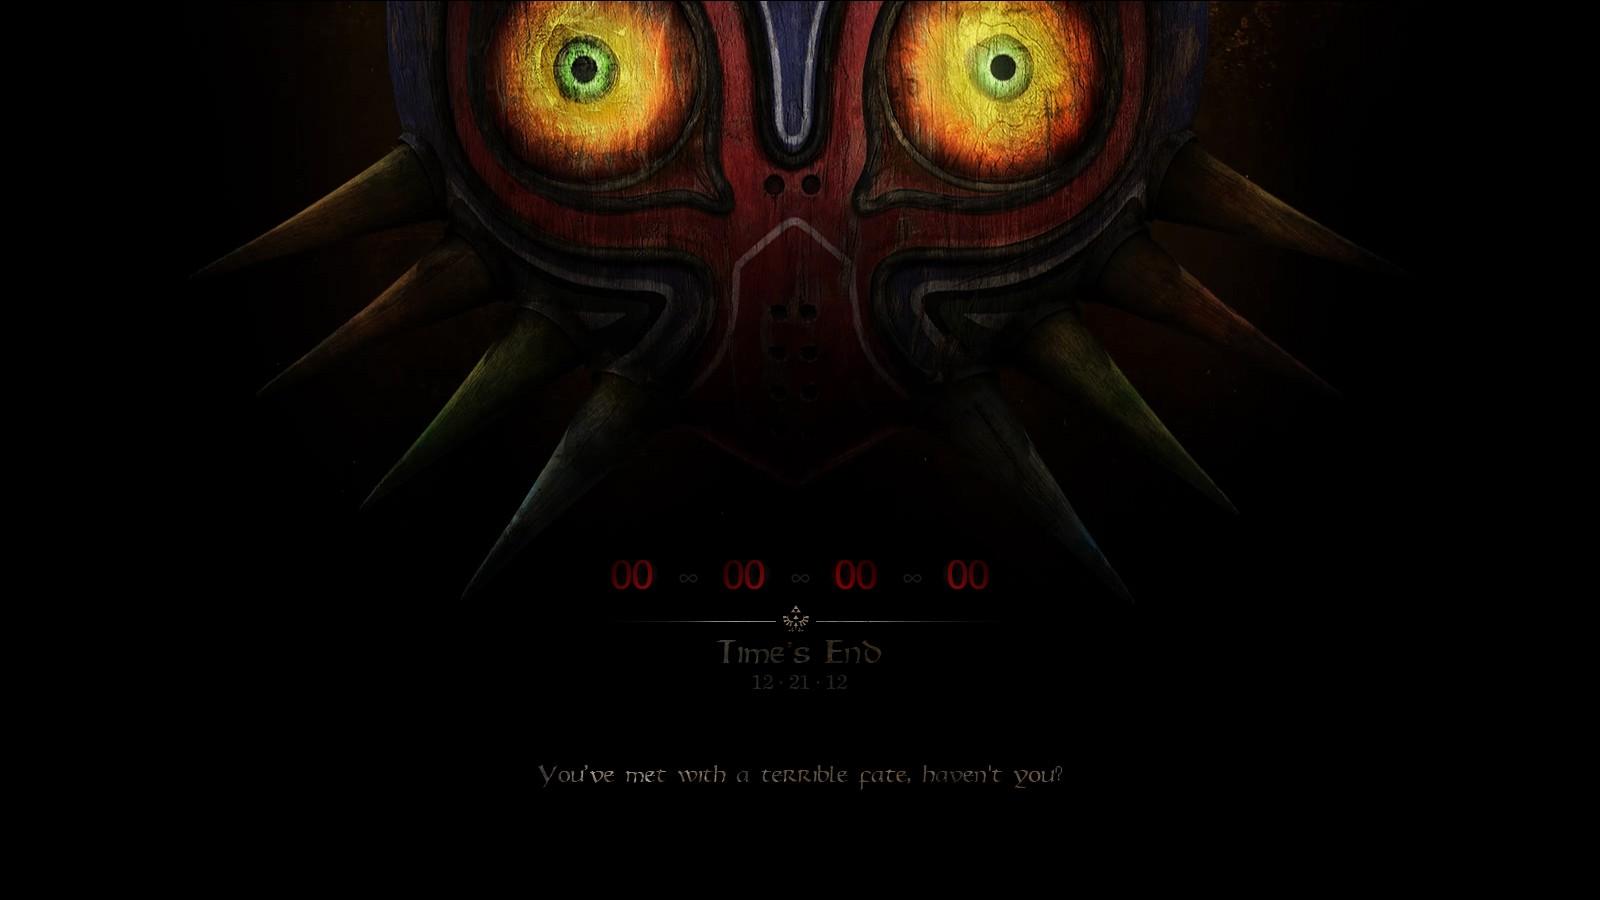 Majoras Mask Skull Kid Wallpaper Masks End Skull Kid The Legend 1600x900